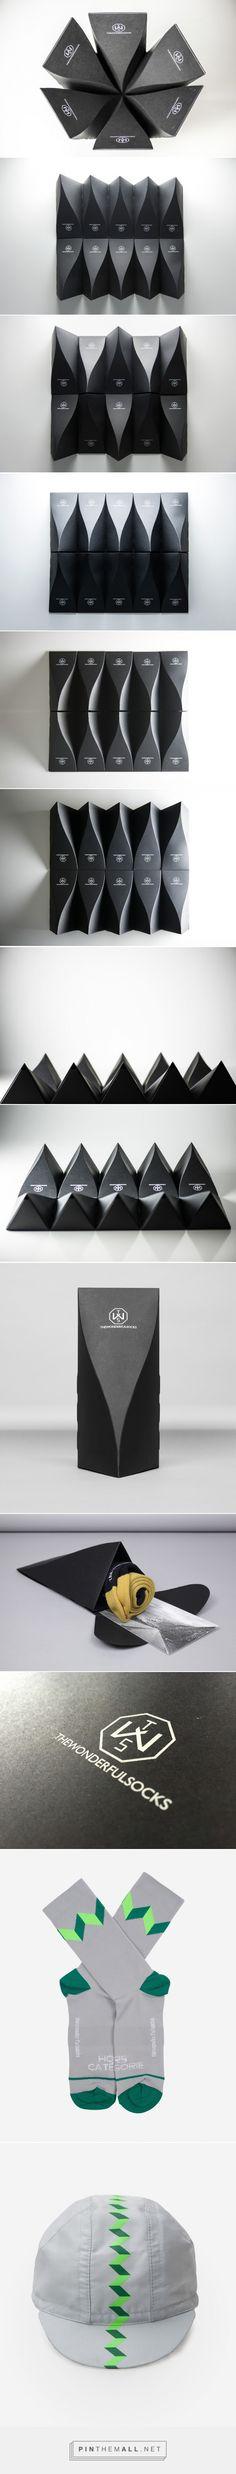 "The wonderful socks packaging designed by Zup Design - <a href=""http://www.packagingoftheworld.com/2015/12/thewonderfulsocks.html"" rel=""nofollow"" target=""_blank"">www.packagingofth...</a>"